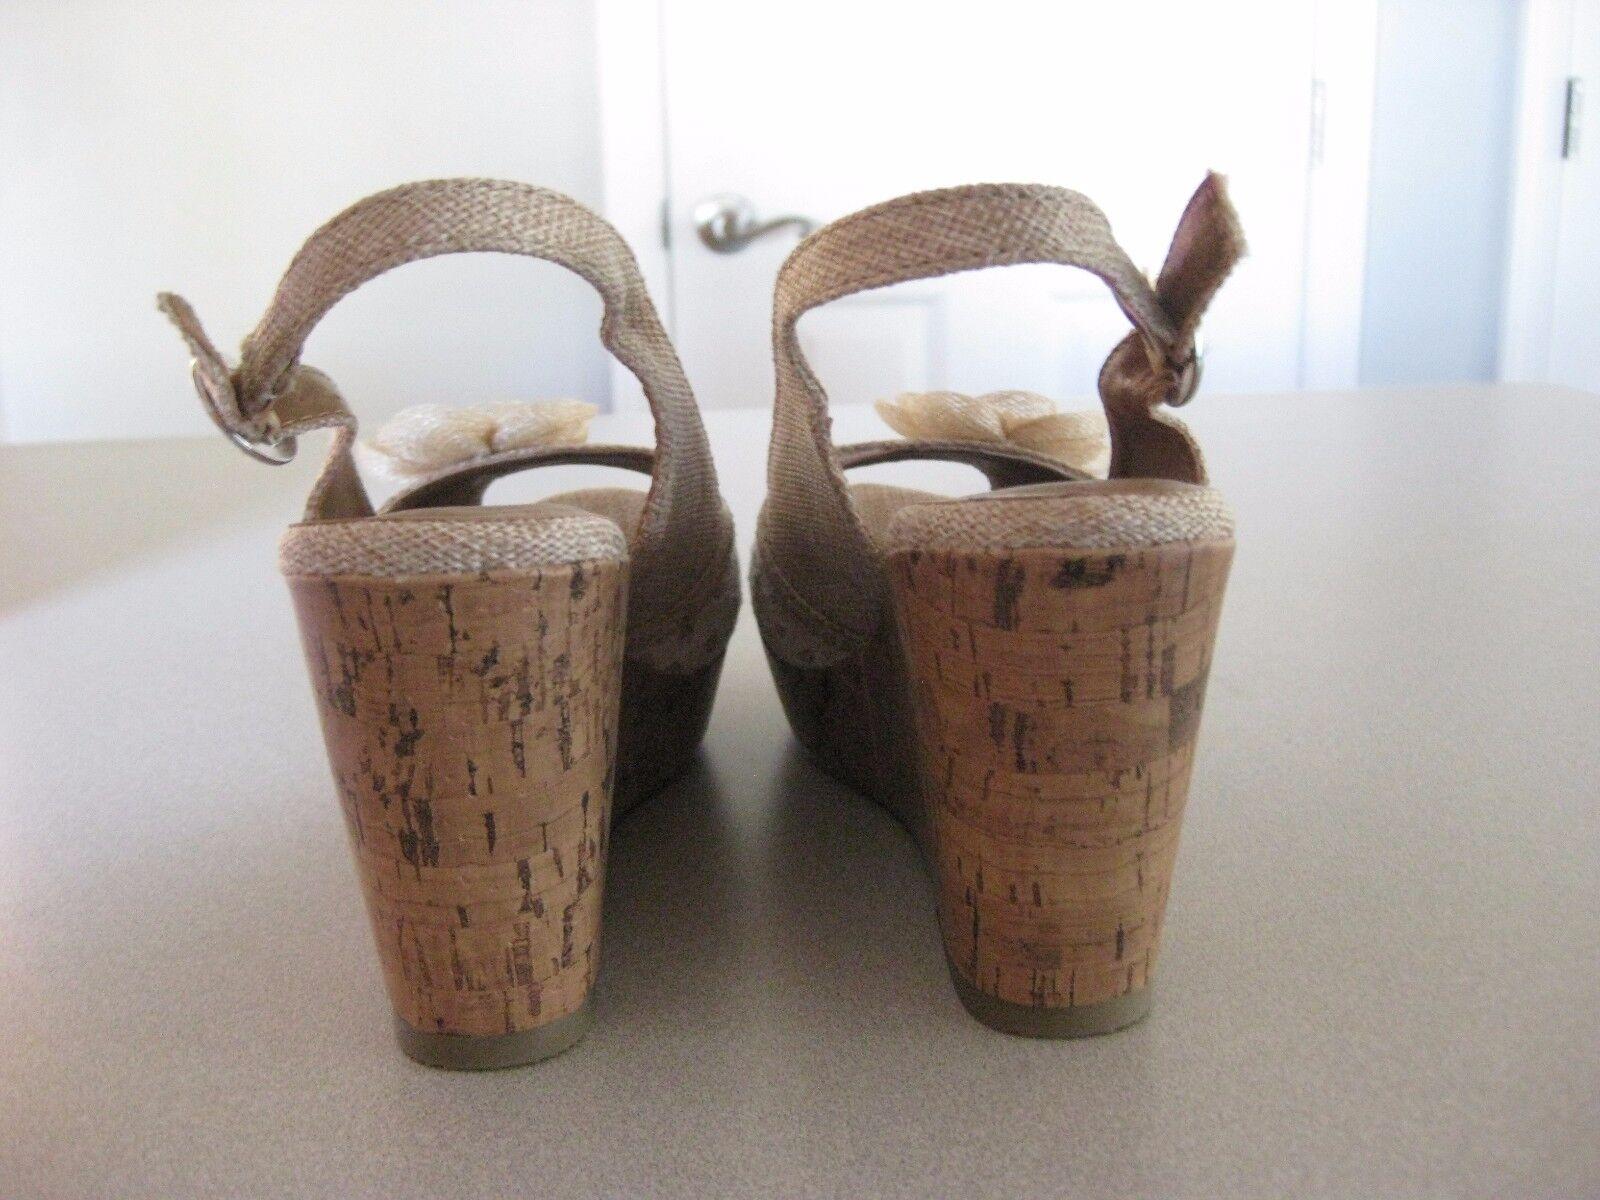 POP KALIE Wedge Wedge Wedge Heel Sandals   Farbe Labeled Natural   6.5   BNIB 6f2b39